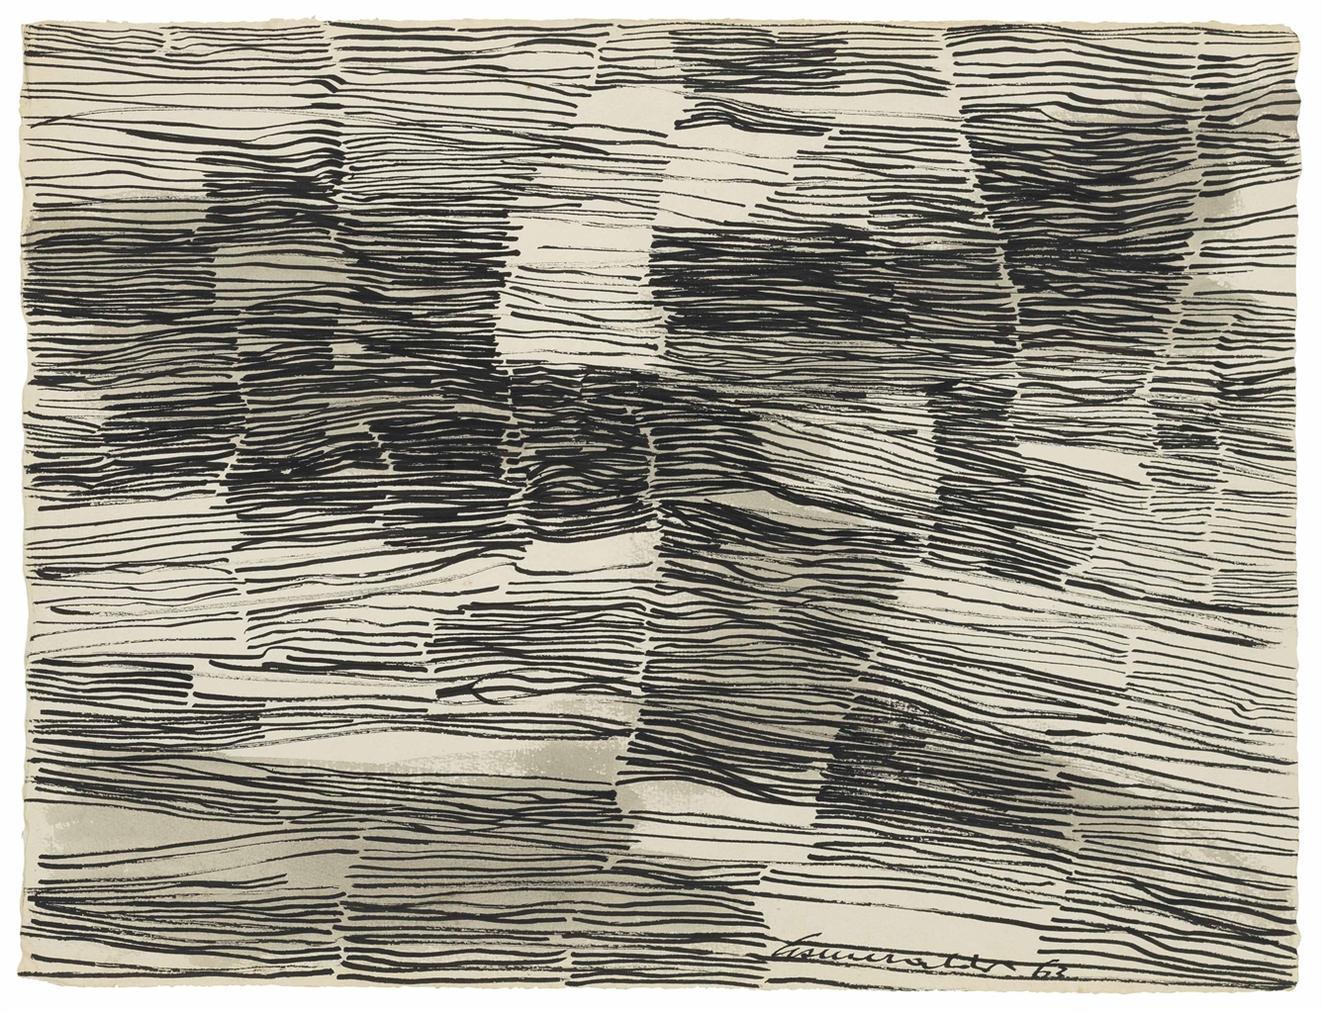 Servulo Esmeraldo-Untitled-1963